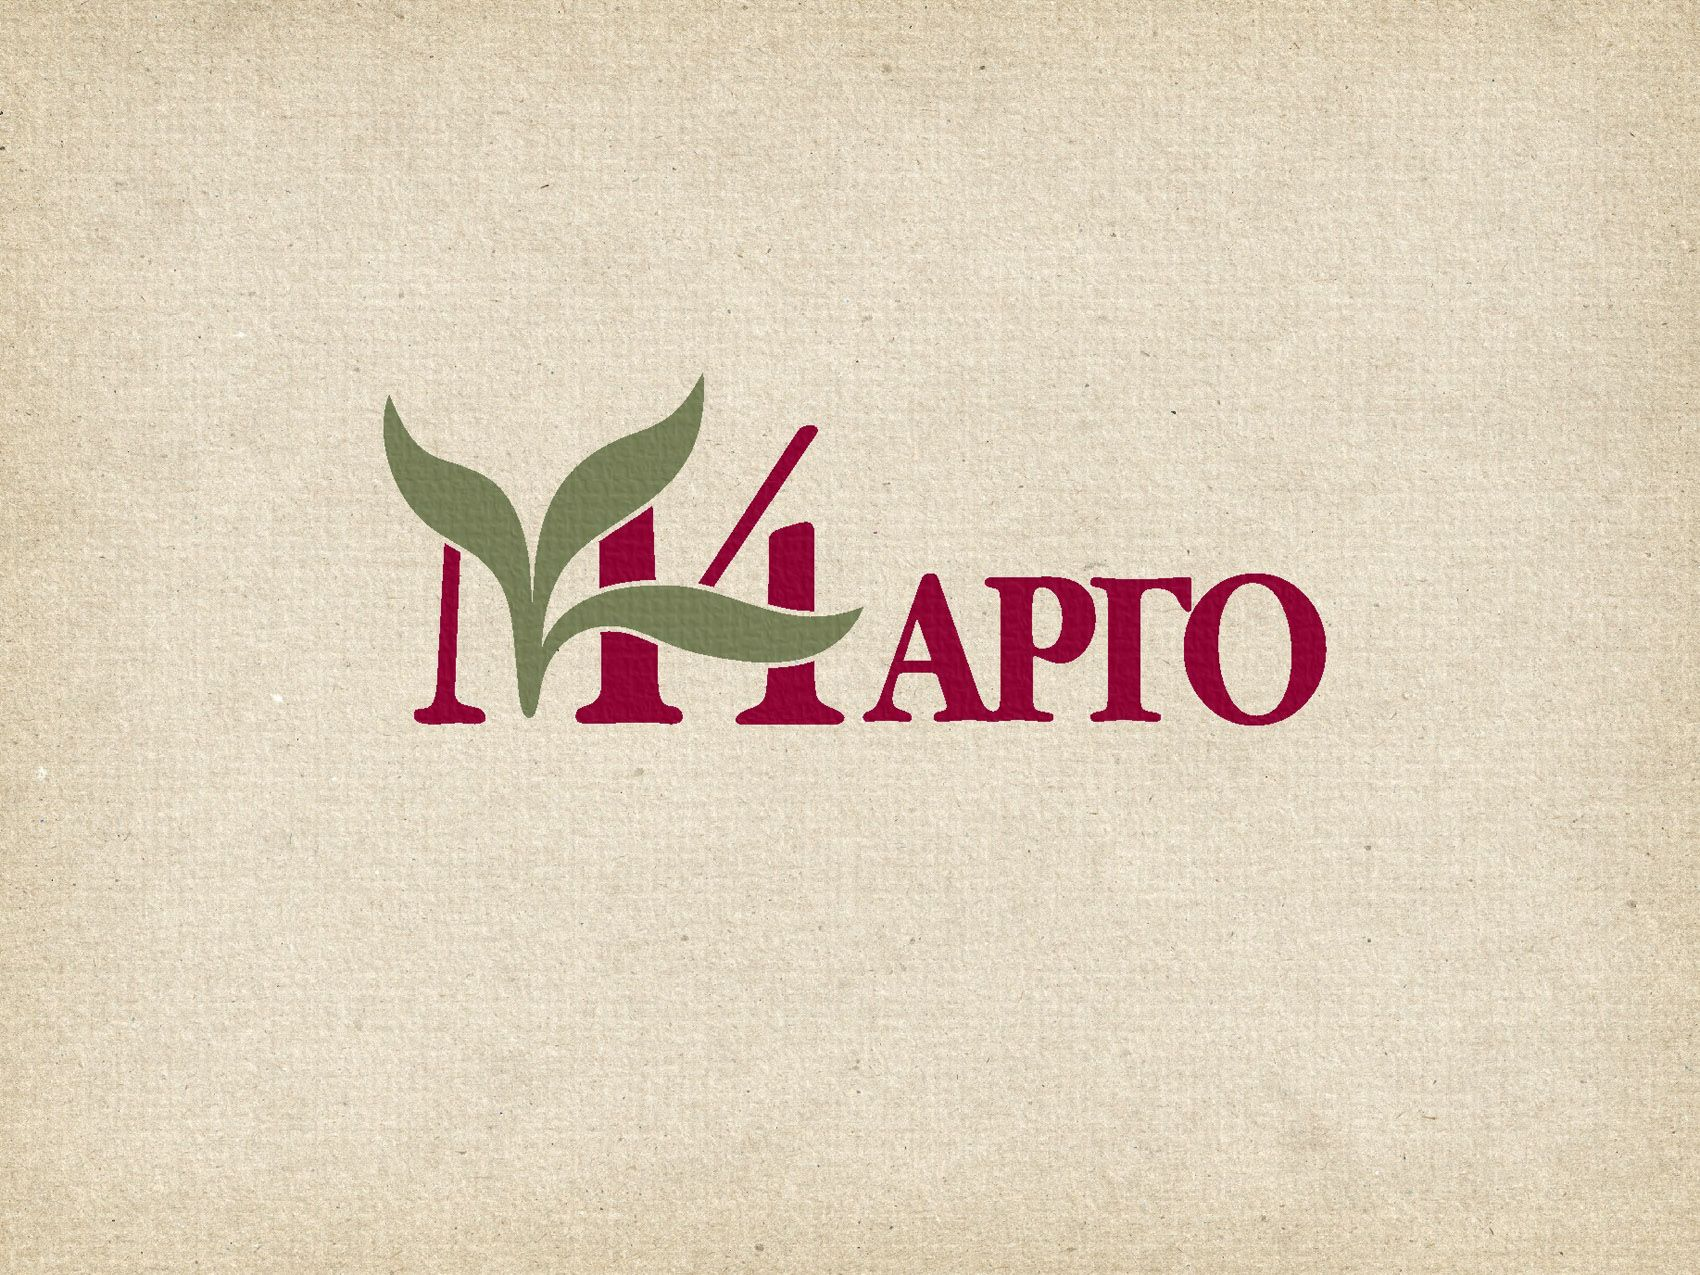 Логотип для M4 АГРО - Российские фрукты - дизайнер Zheravin